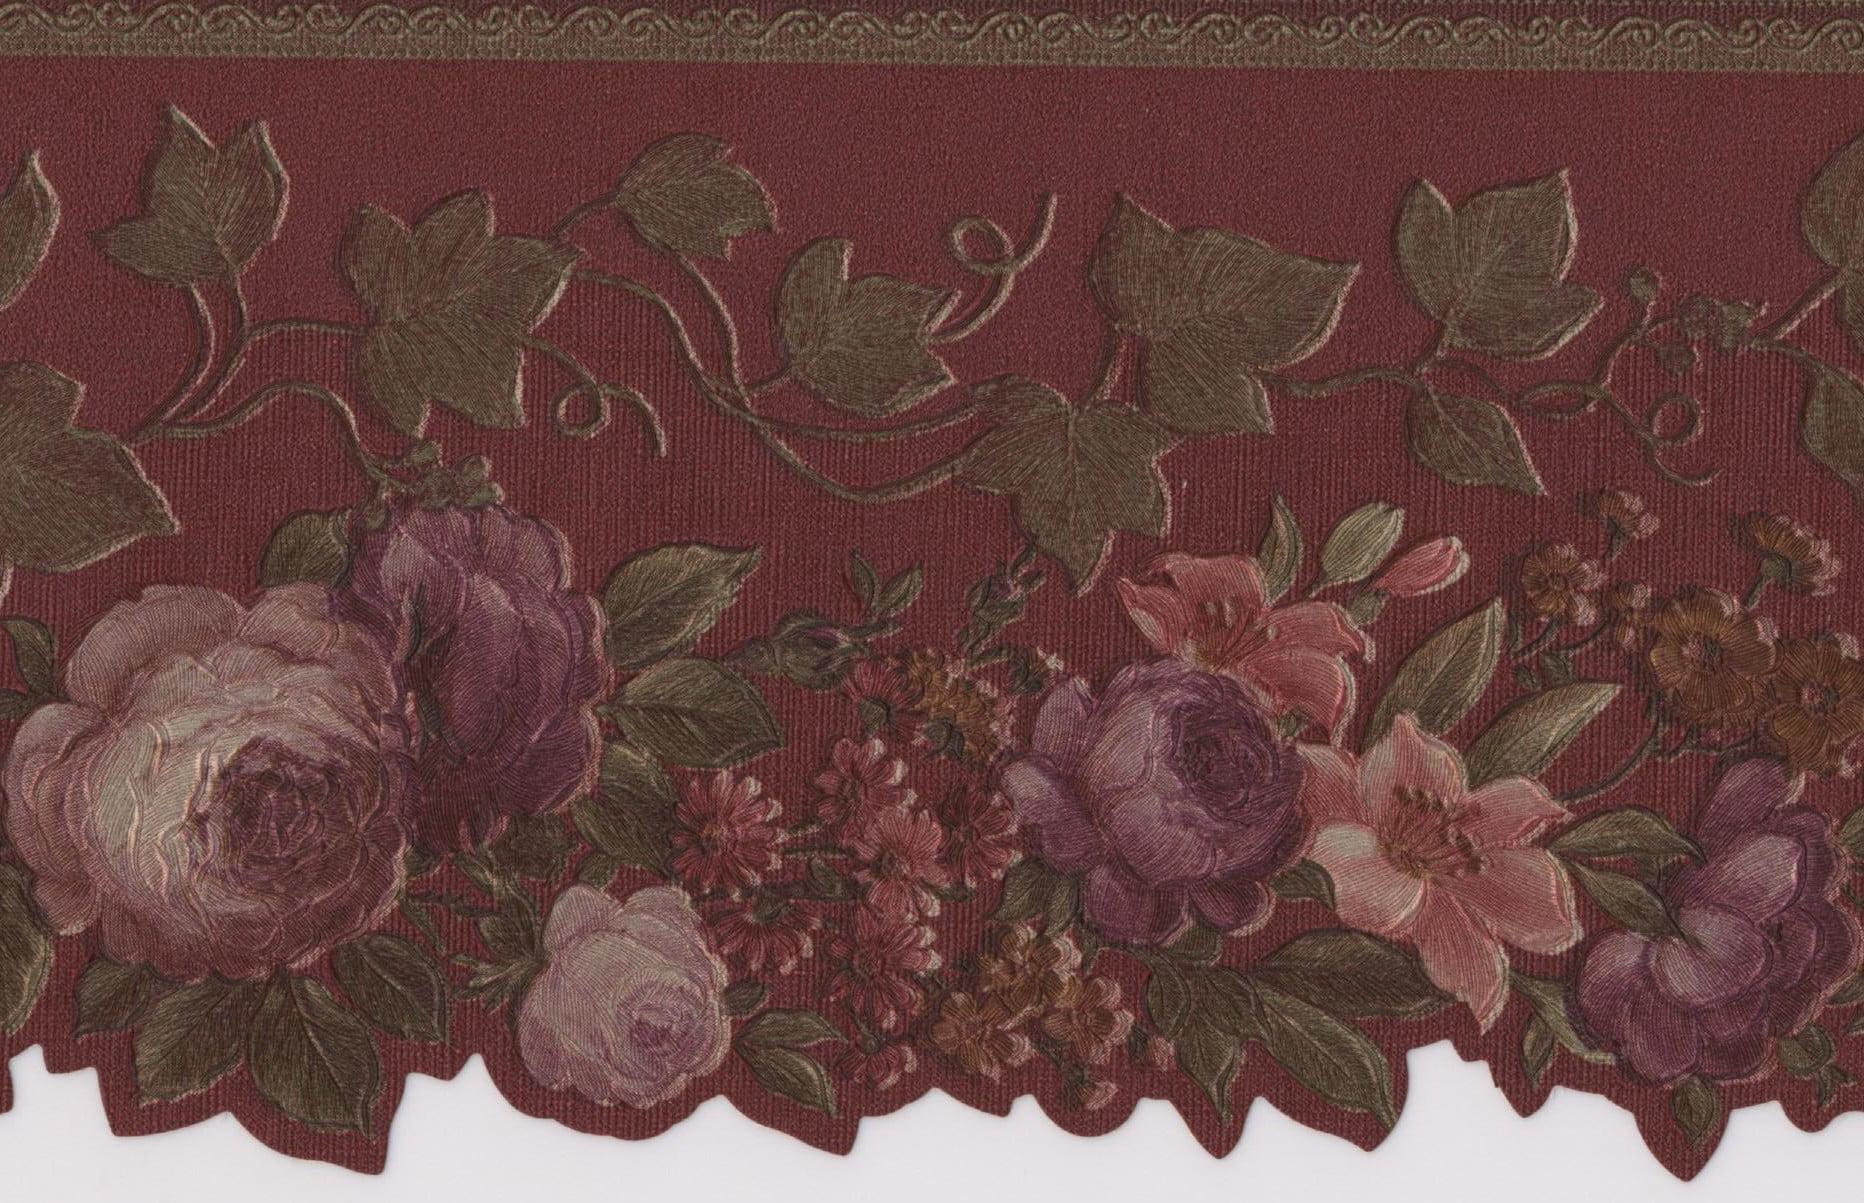 Pink Red Purple Blooming Roses Vintage Floral Wallpaper Border